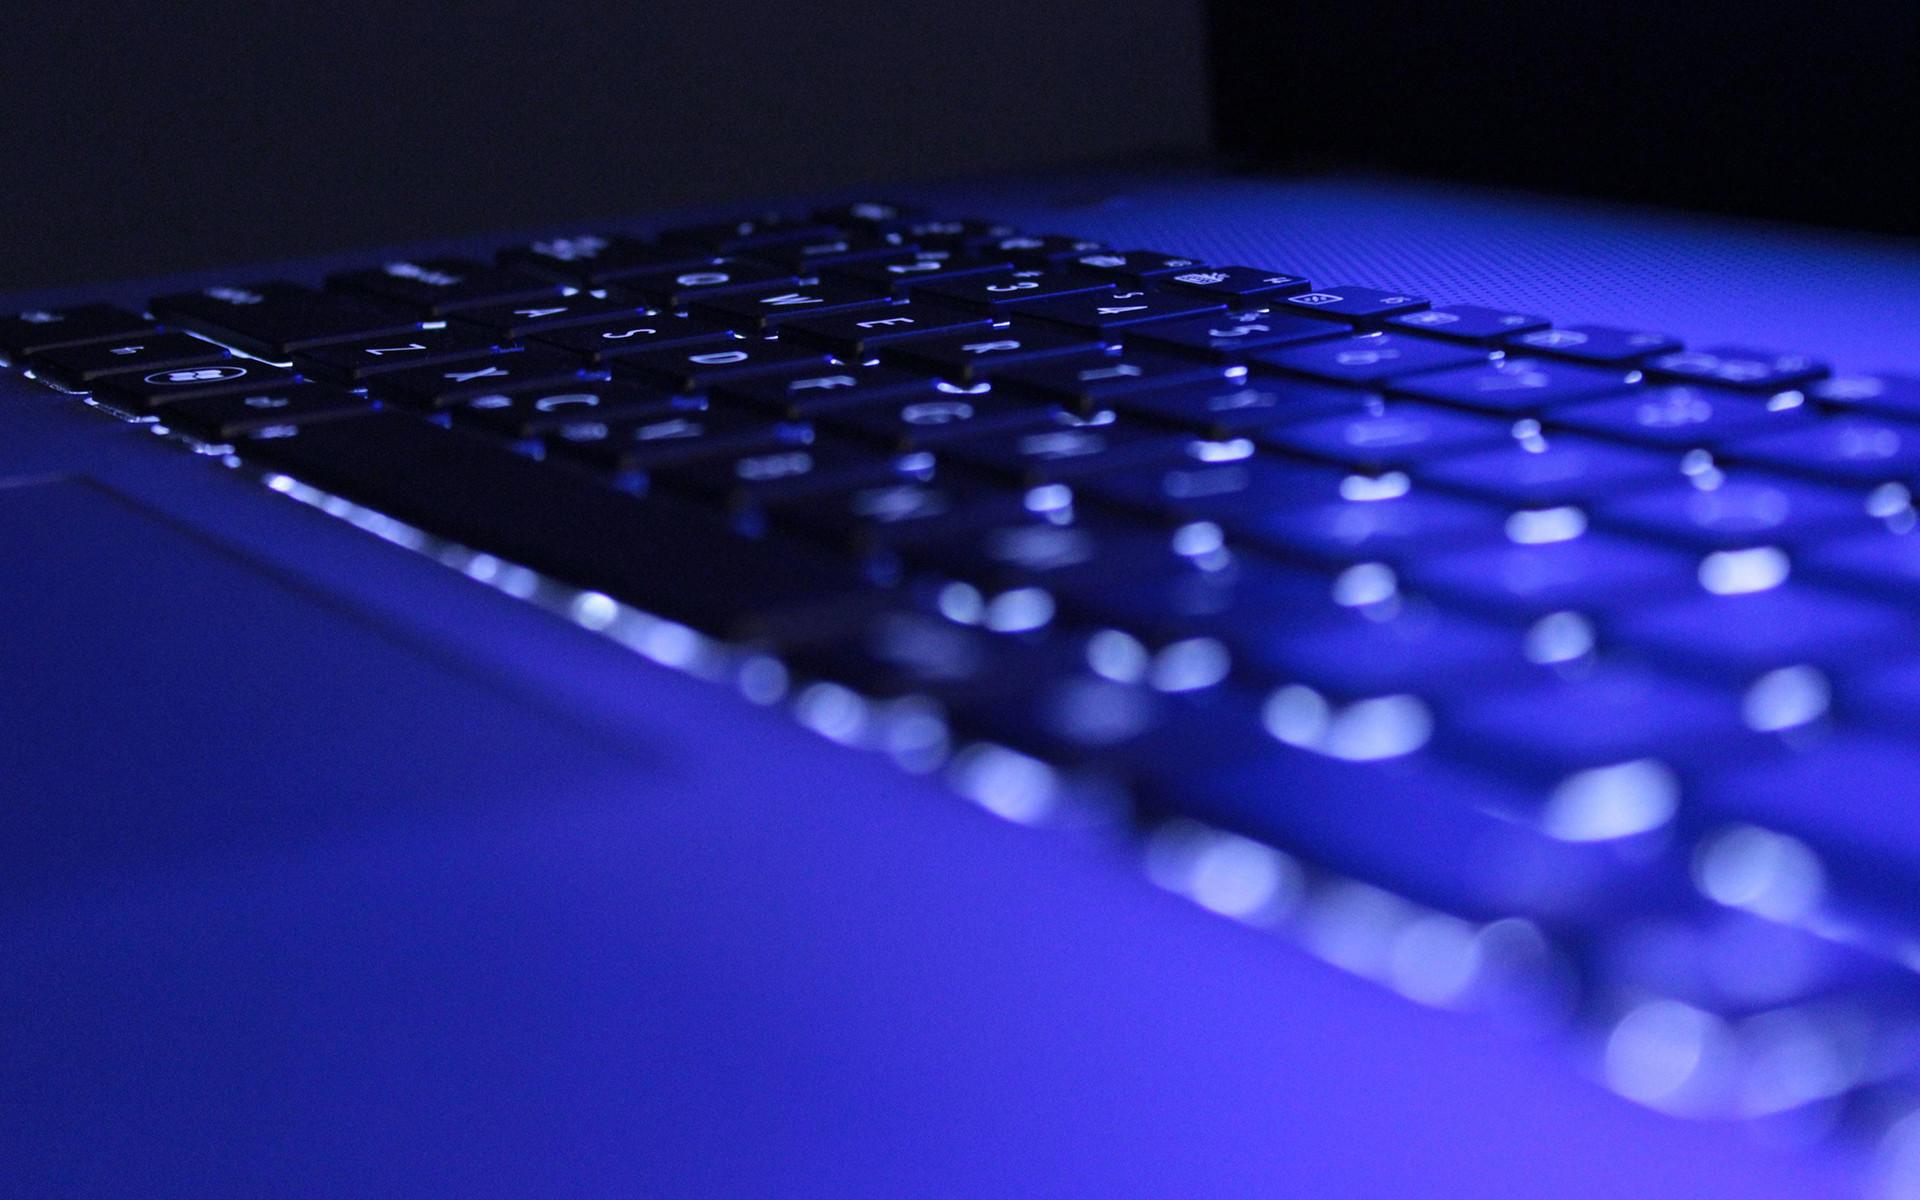 Keyboard Macro Blue computer wallpaper | | 45213 | WallpaperUP